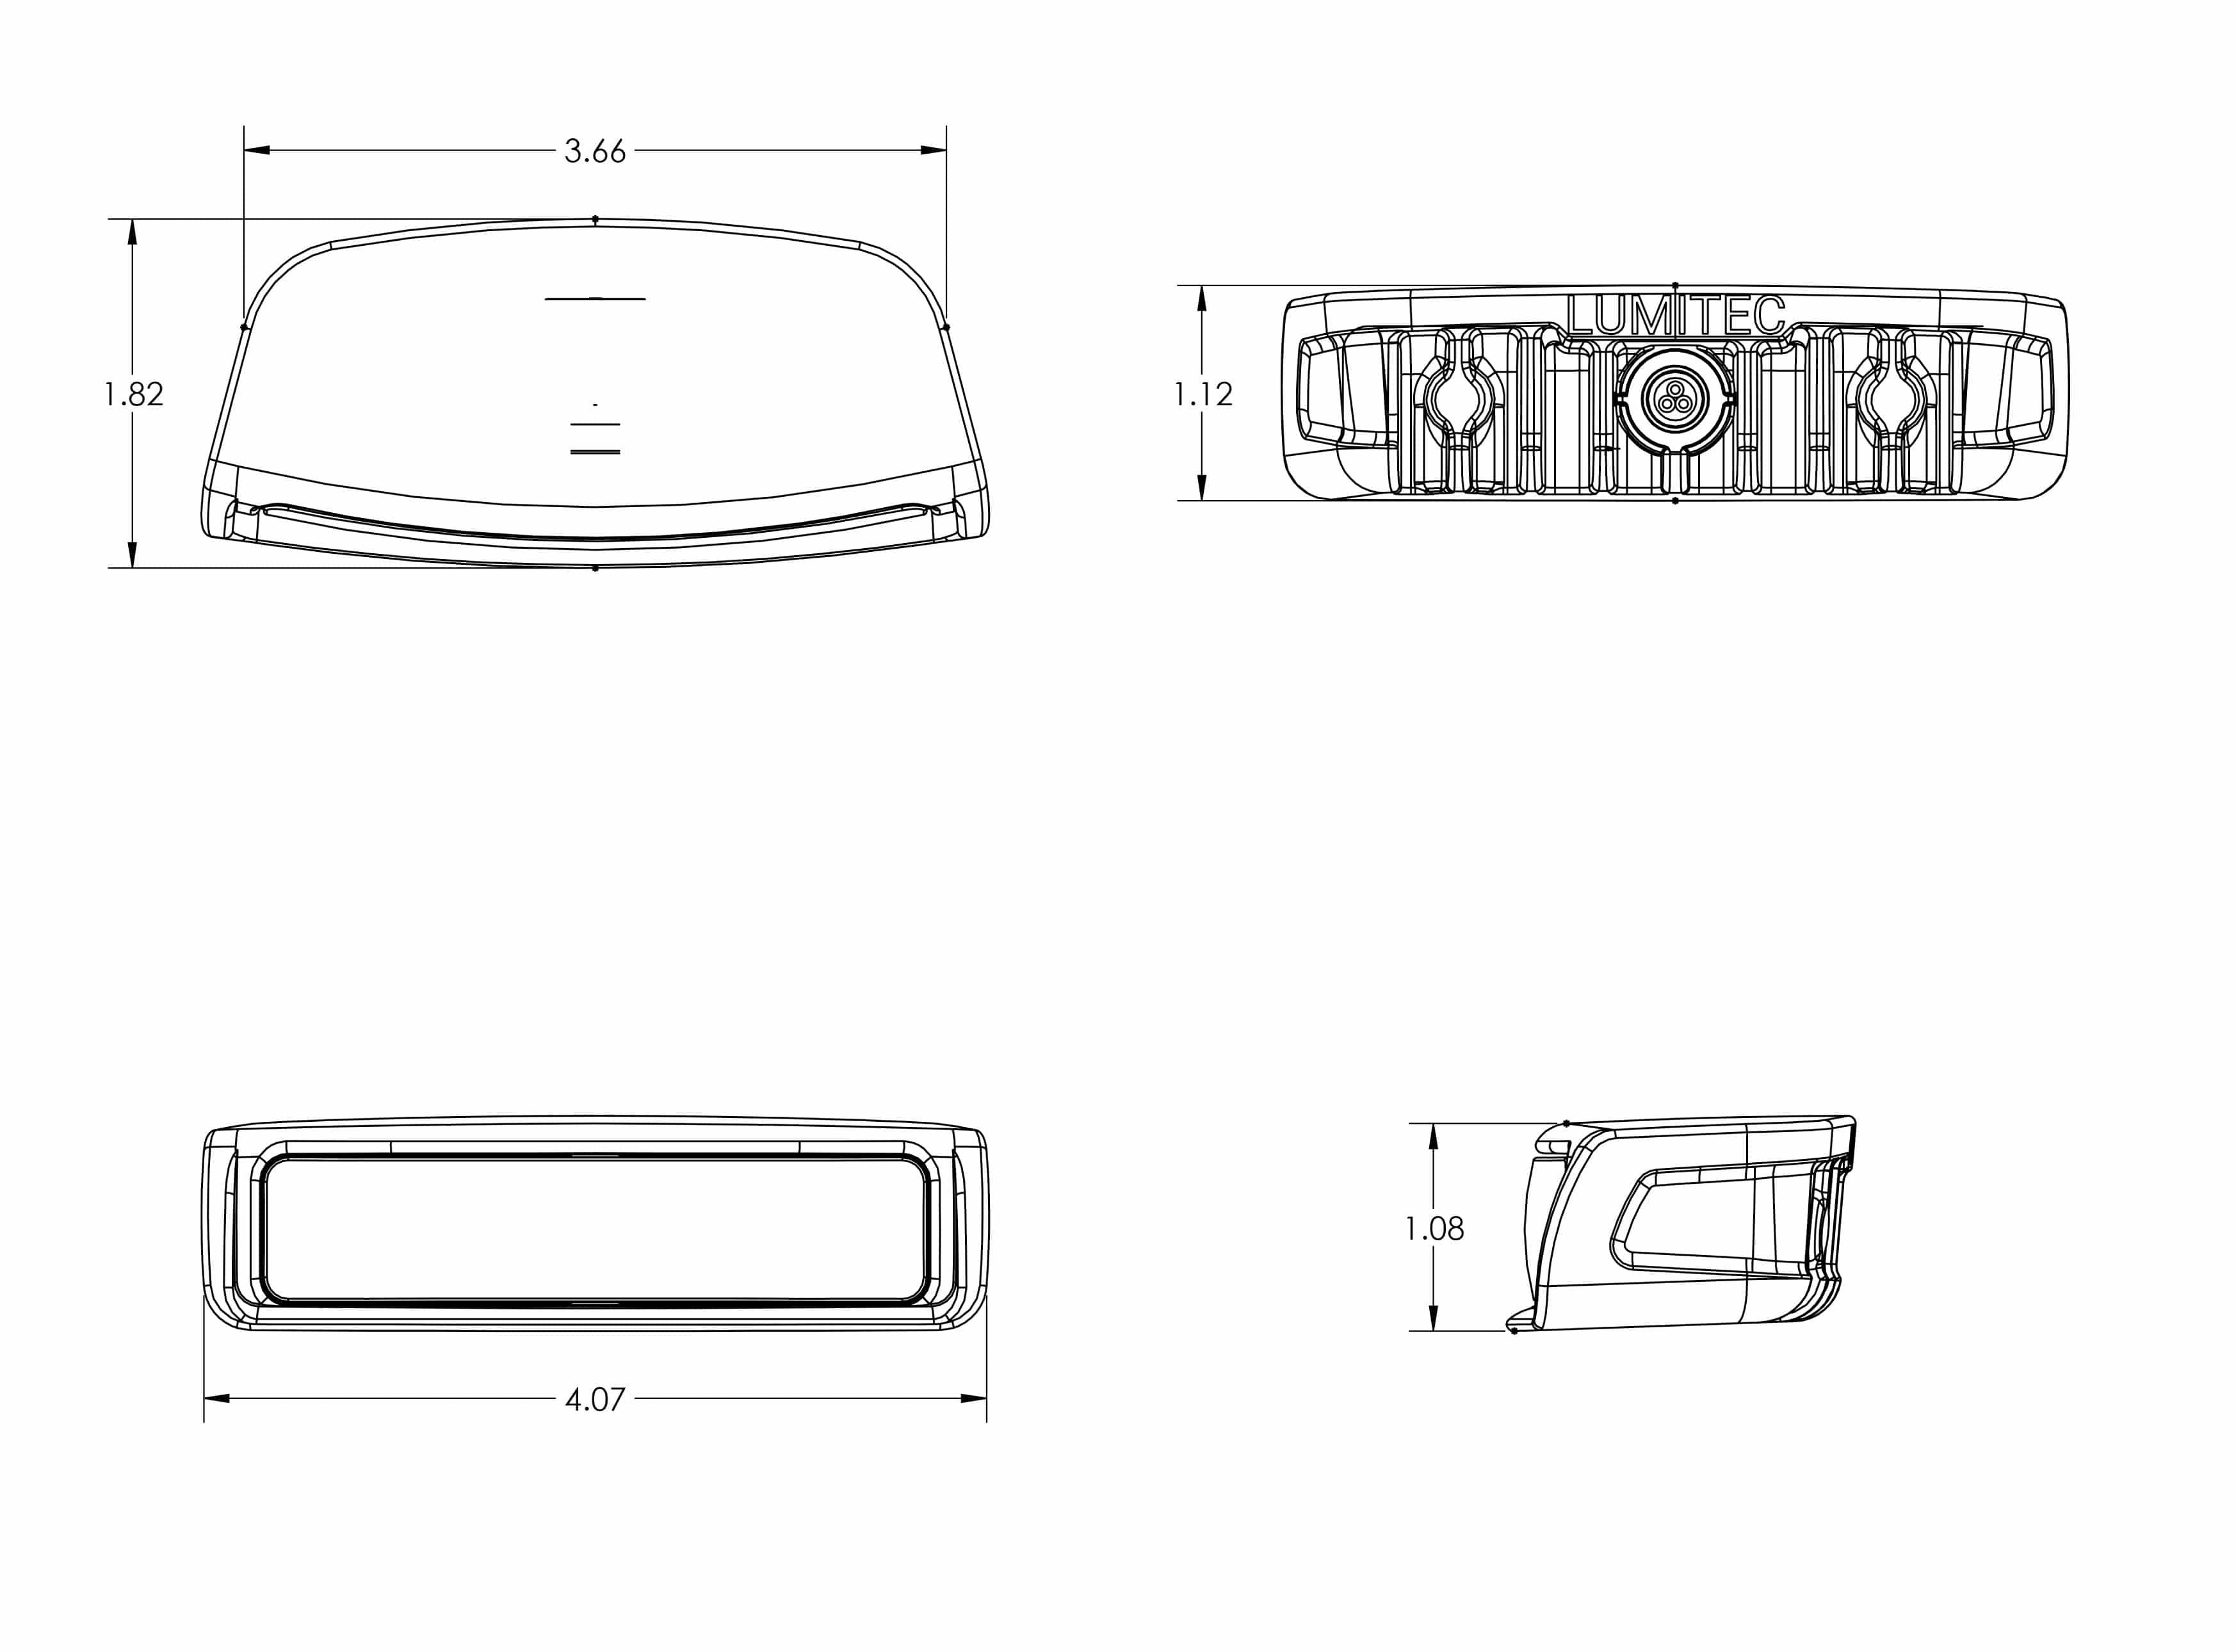 nav-docking-dimensions.jpg